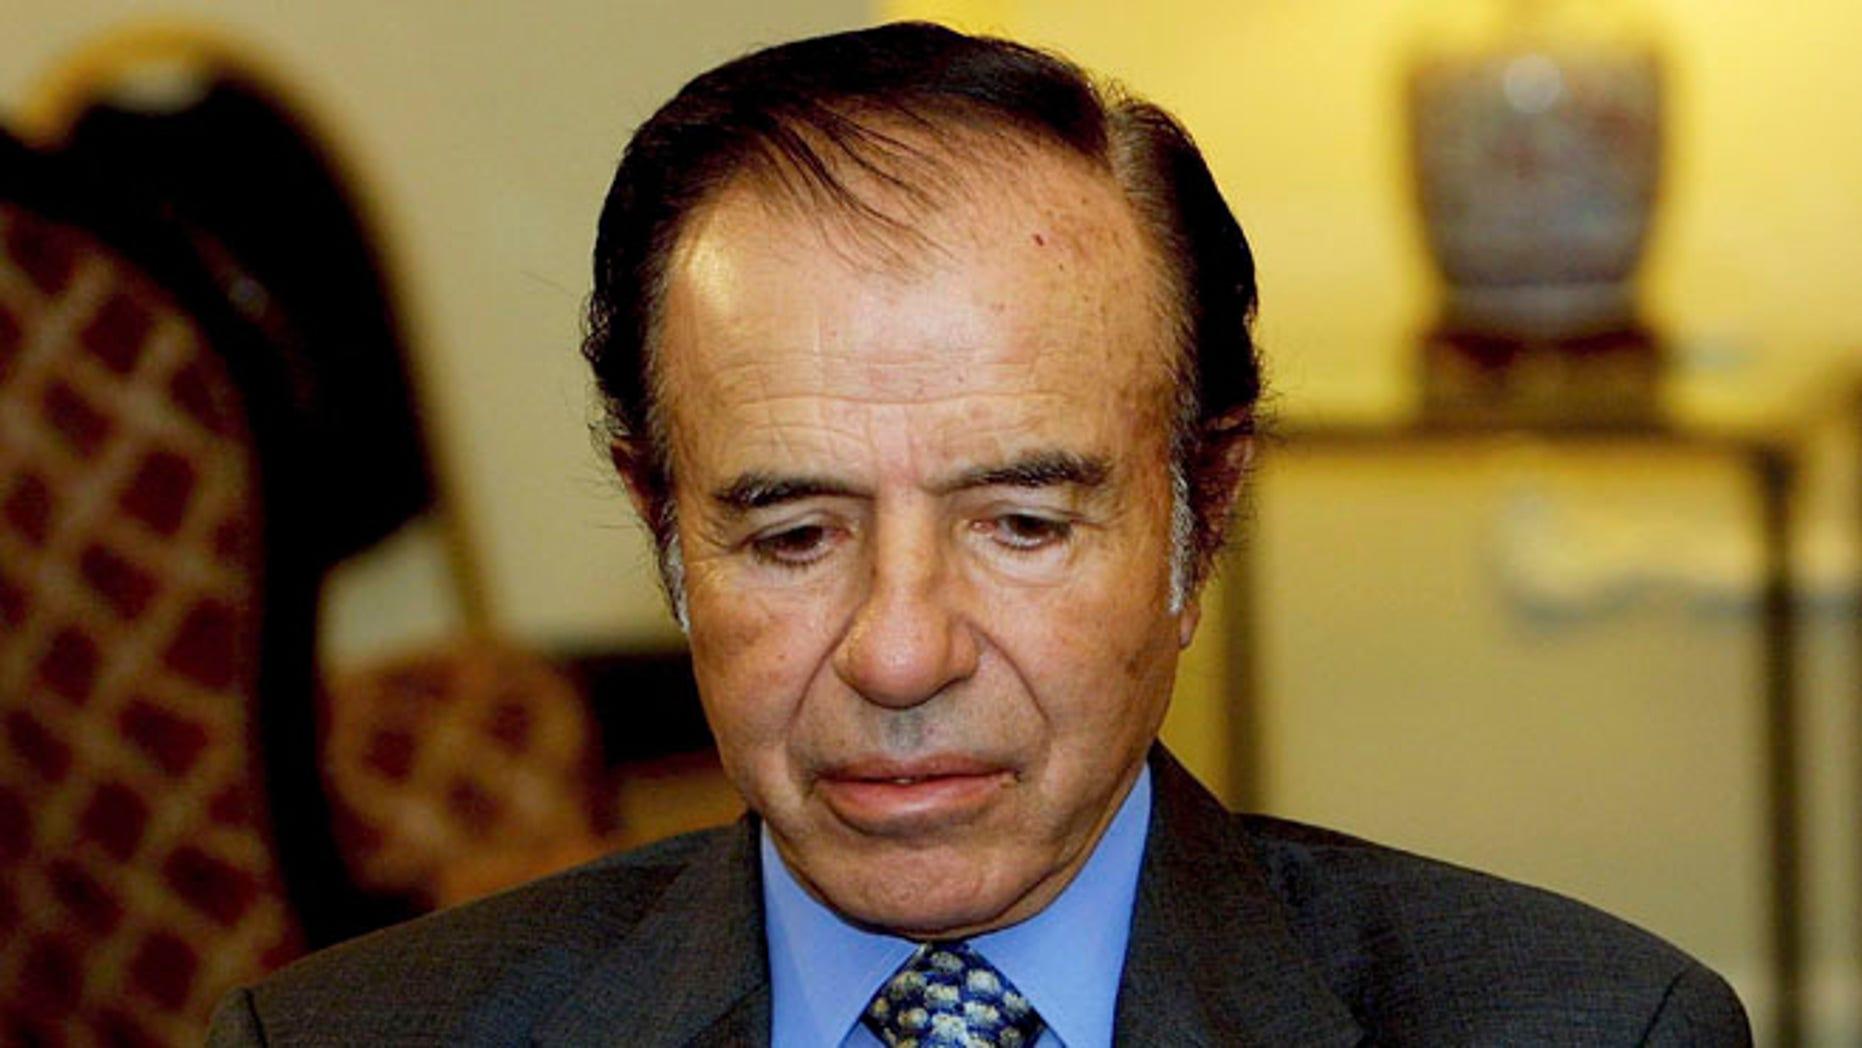 Former Argentinian President Carlos Menem in a 2003 file photo.